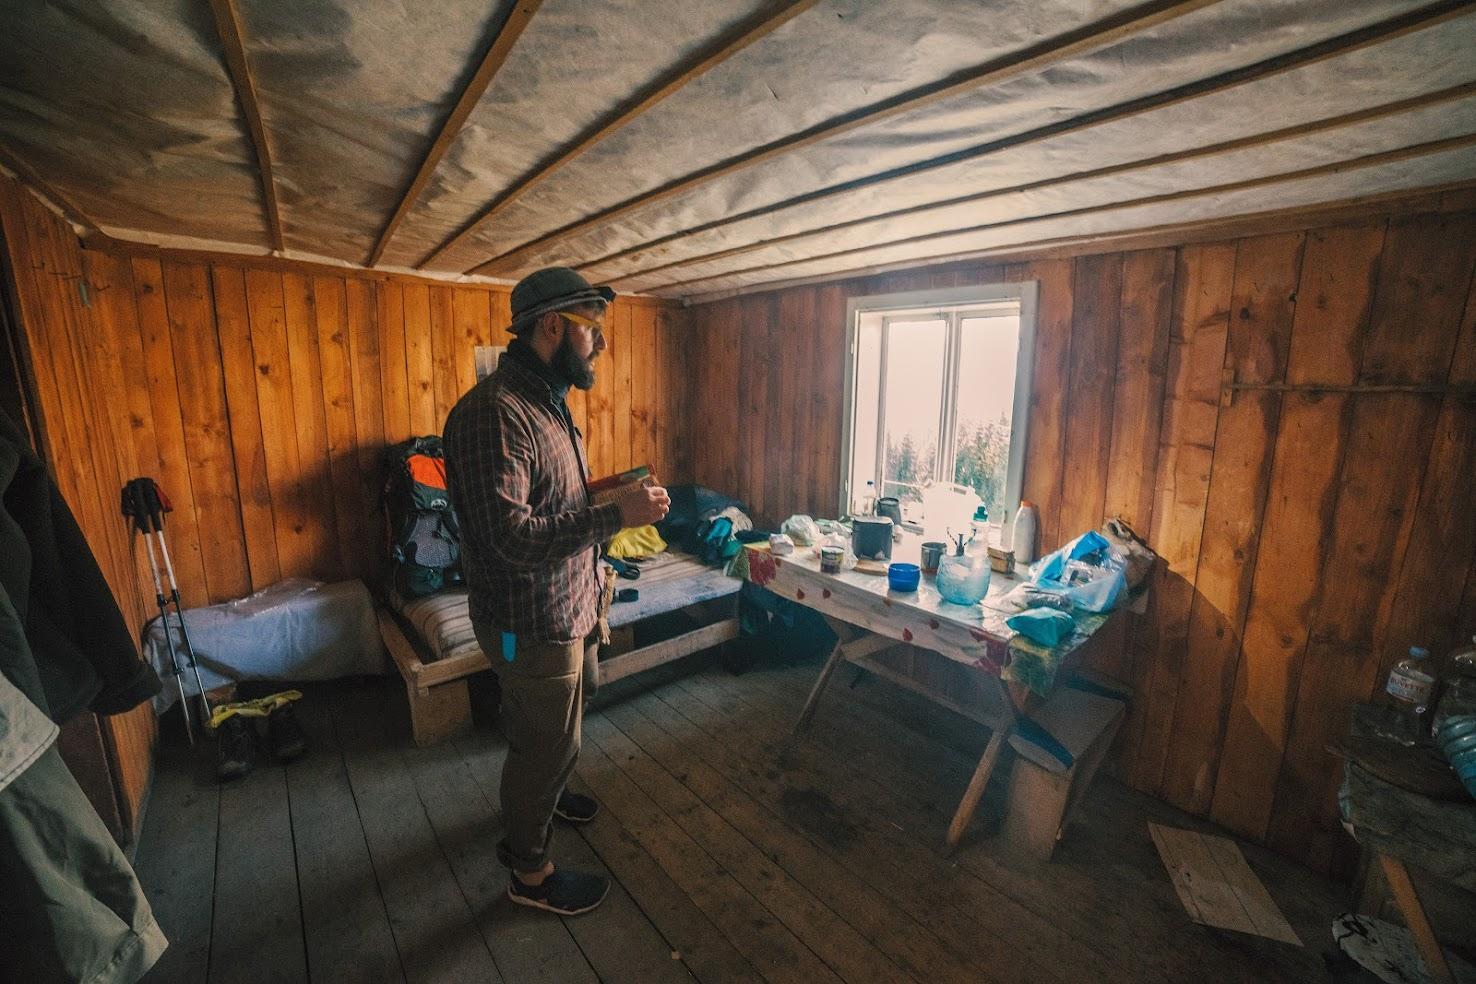 Інтерєр будиночка в горах, Кукул